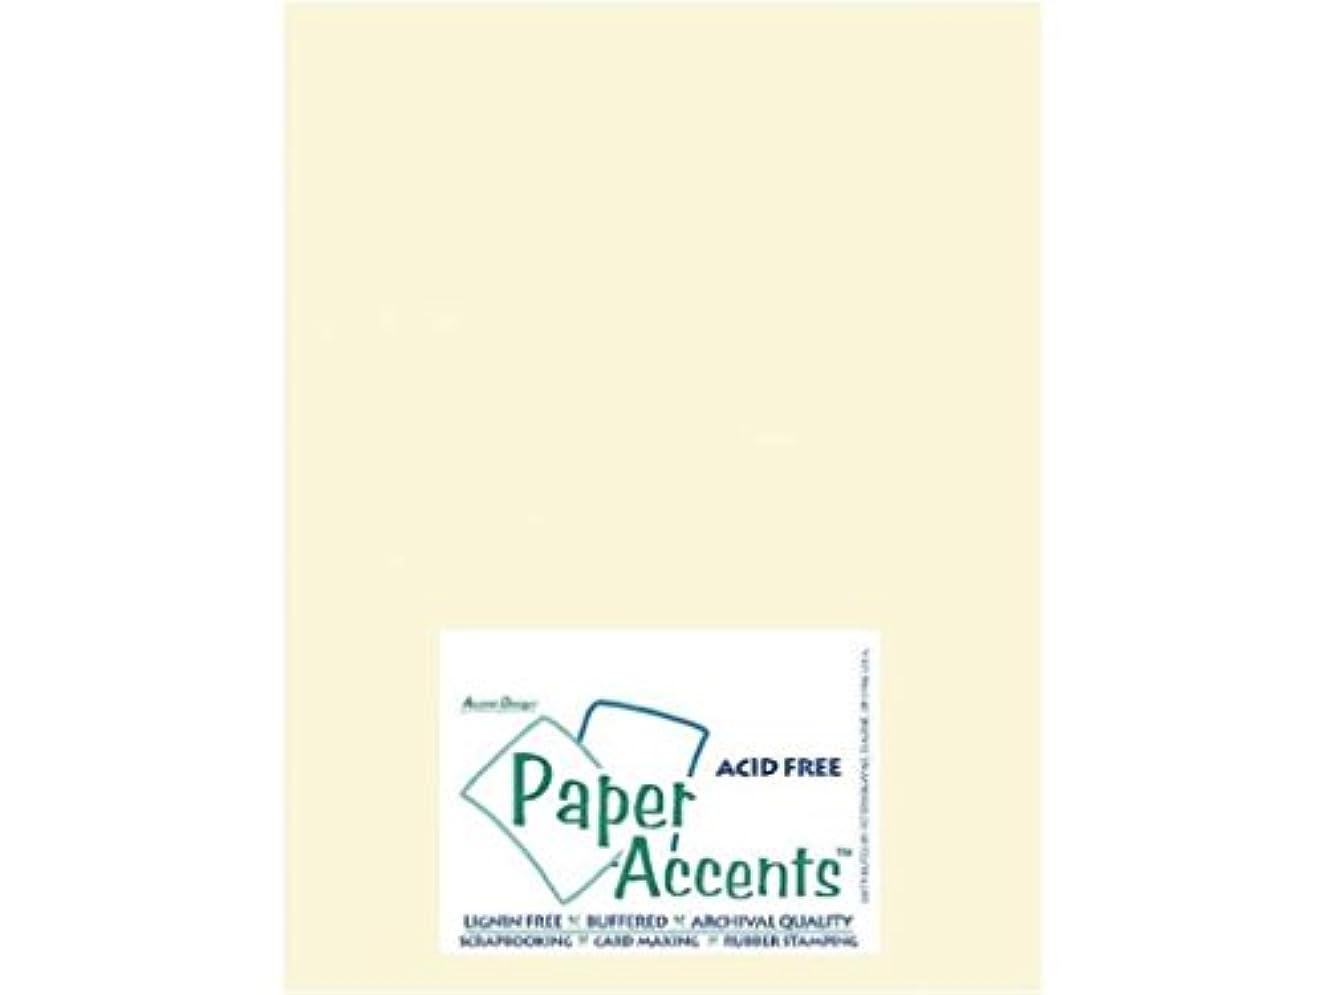 Accent Design Paper Accents Cdstk Smooth 8.5x11 65# Cream Bulk